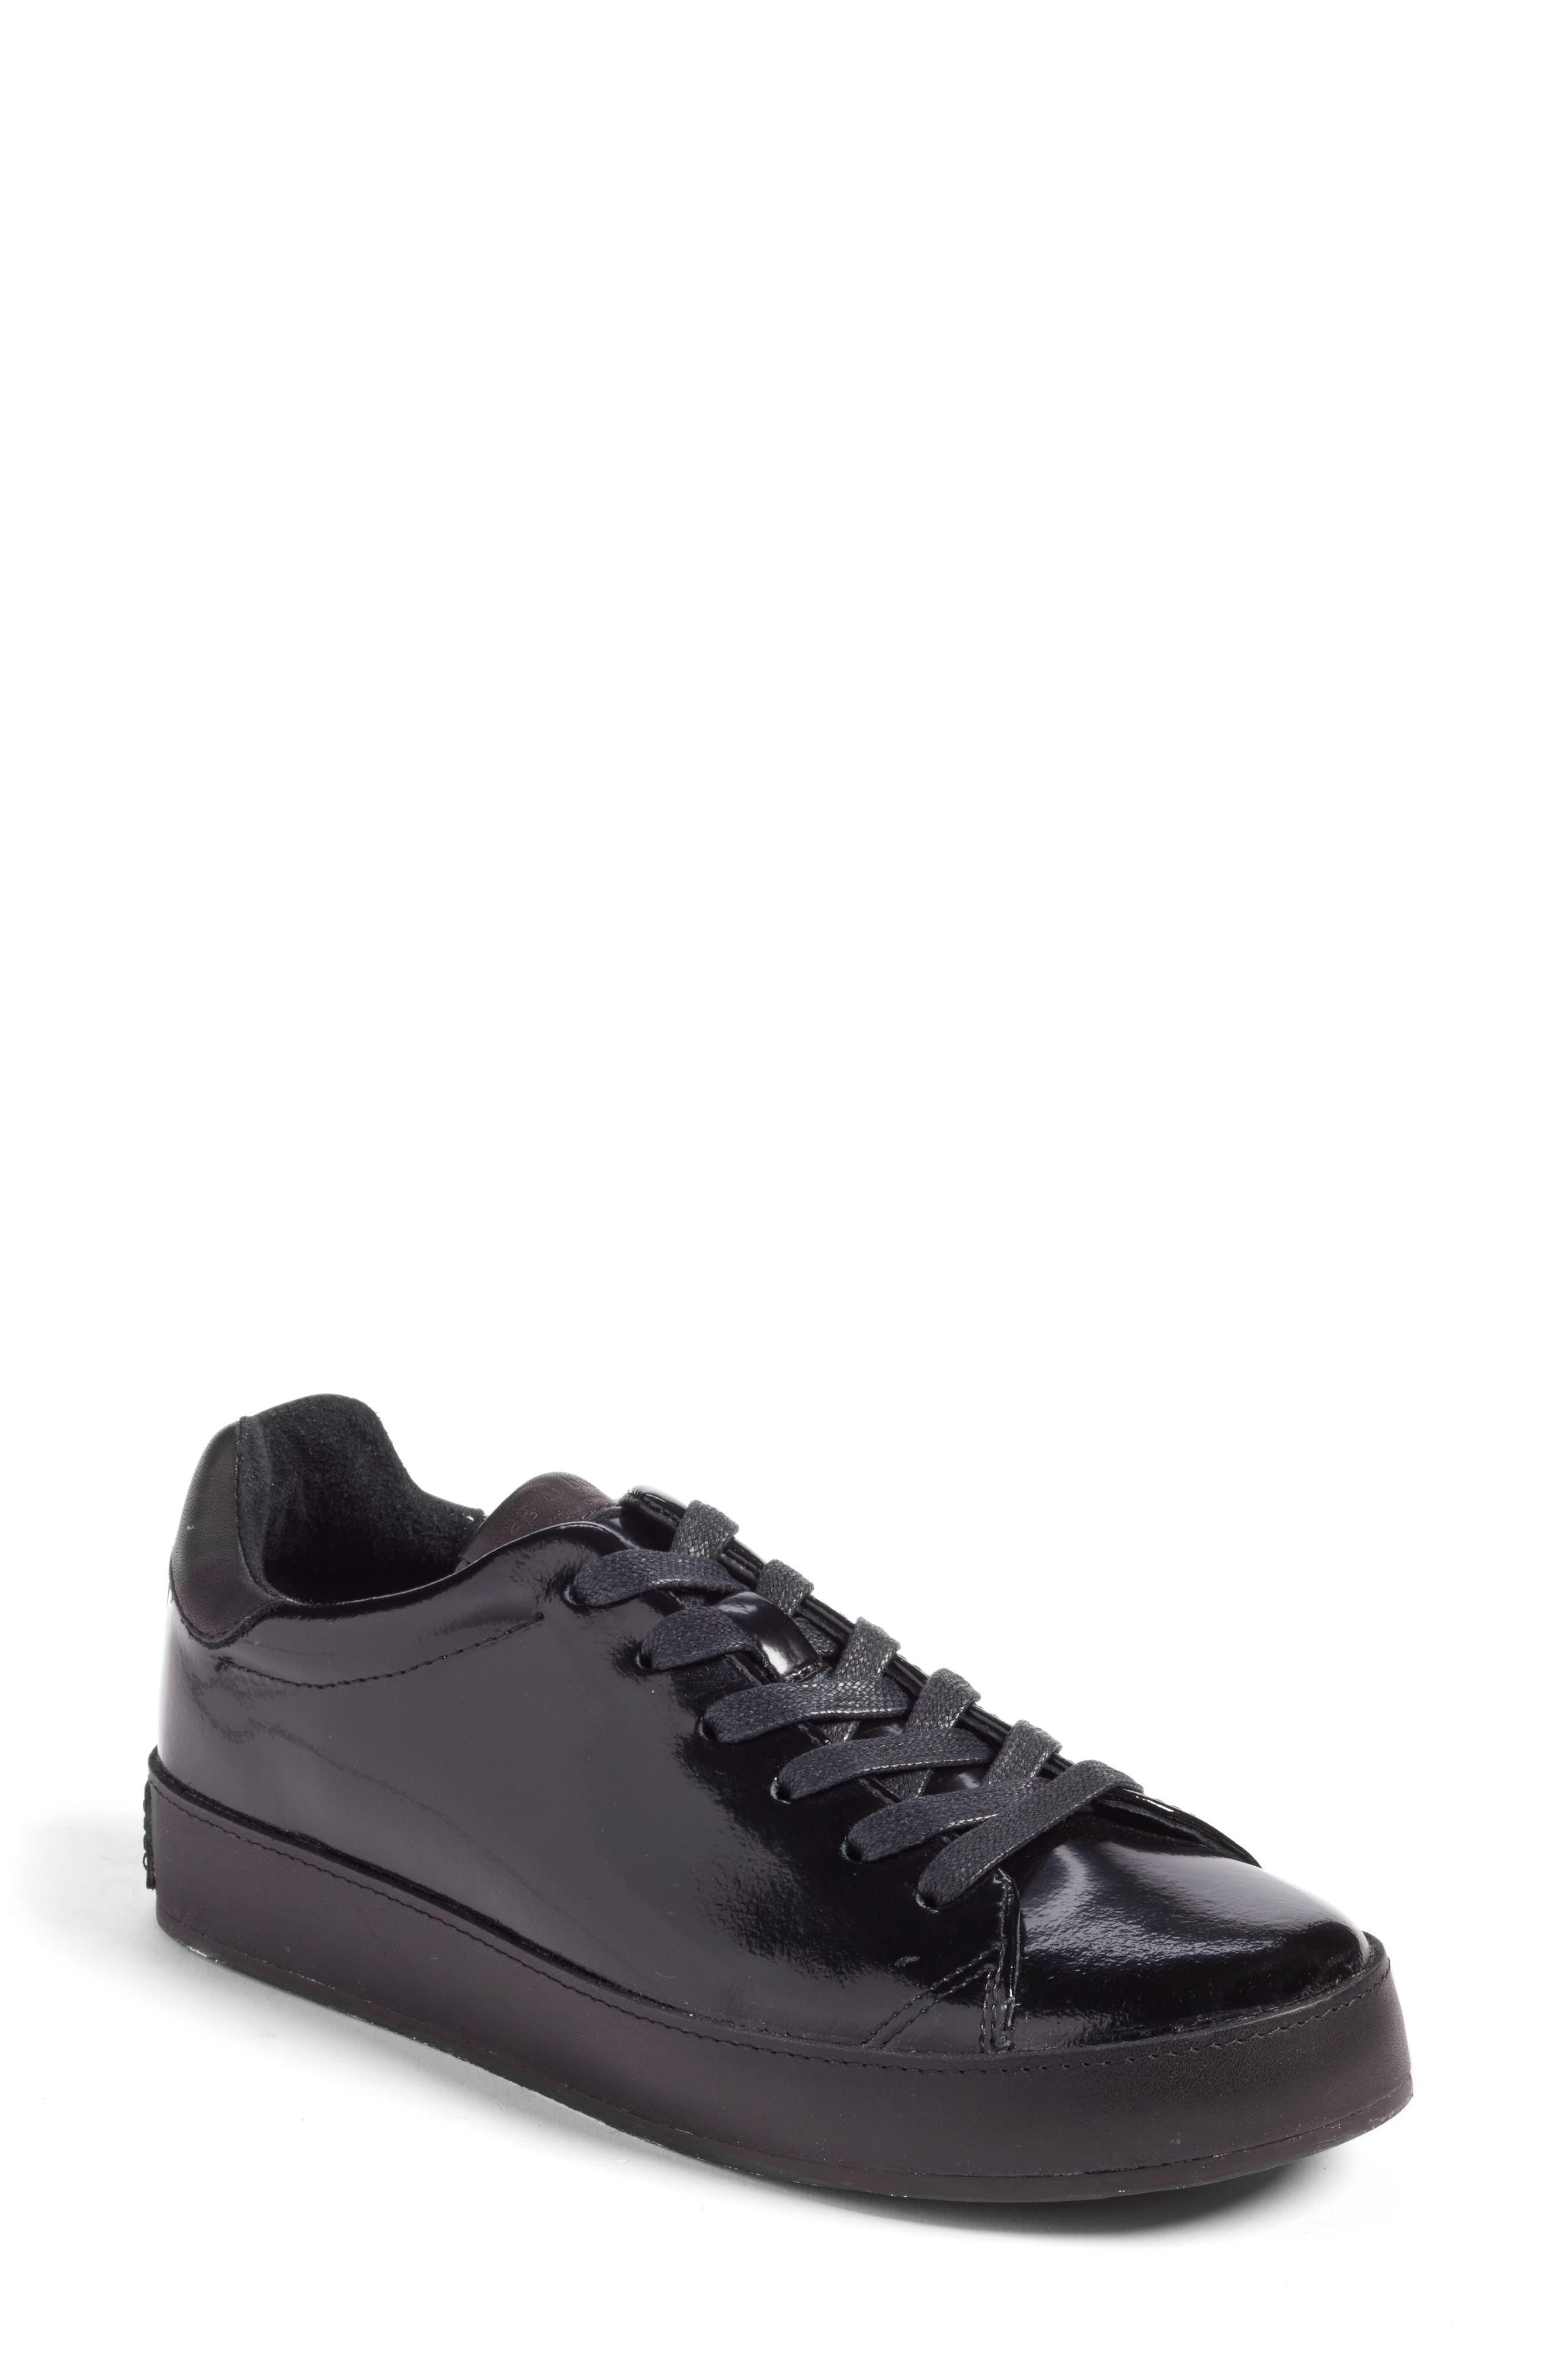 RB1 Low-Top Sneaker,                             Main thumbnail 1, color,                             001